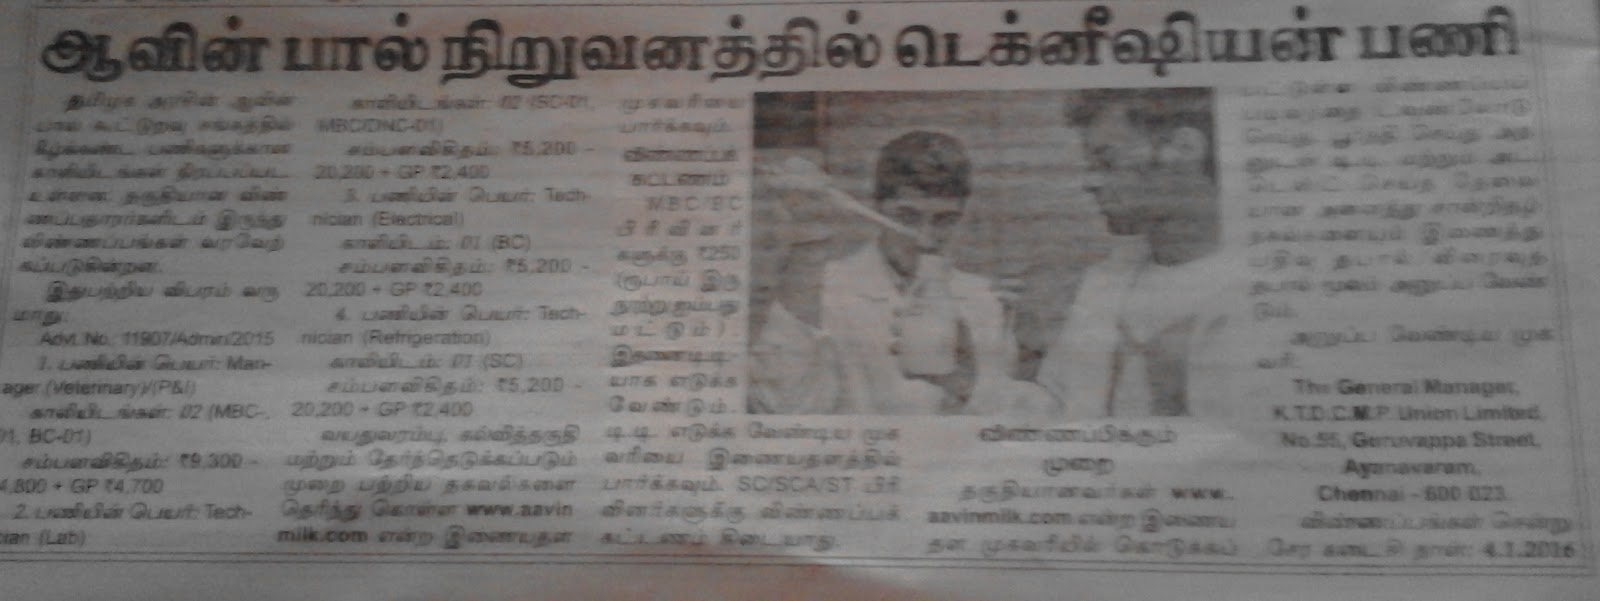 mbc caste list in tamilnadu pdf